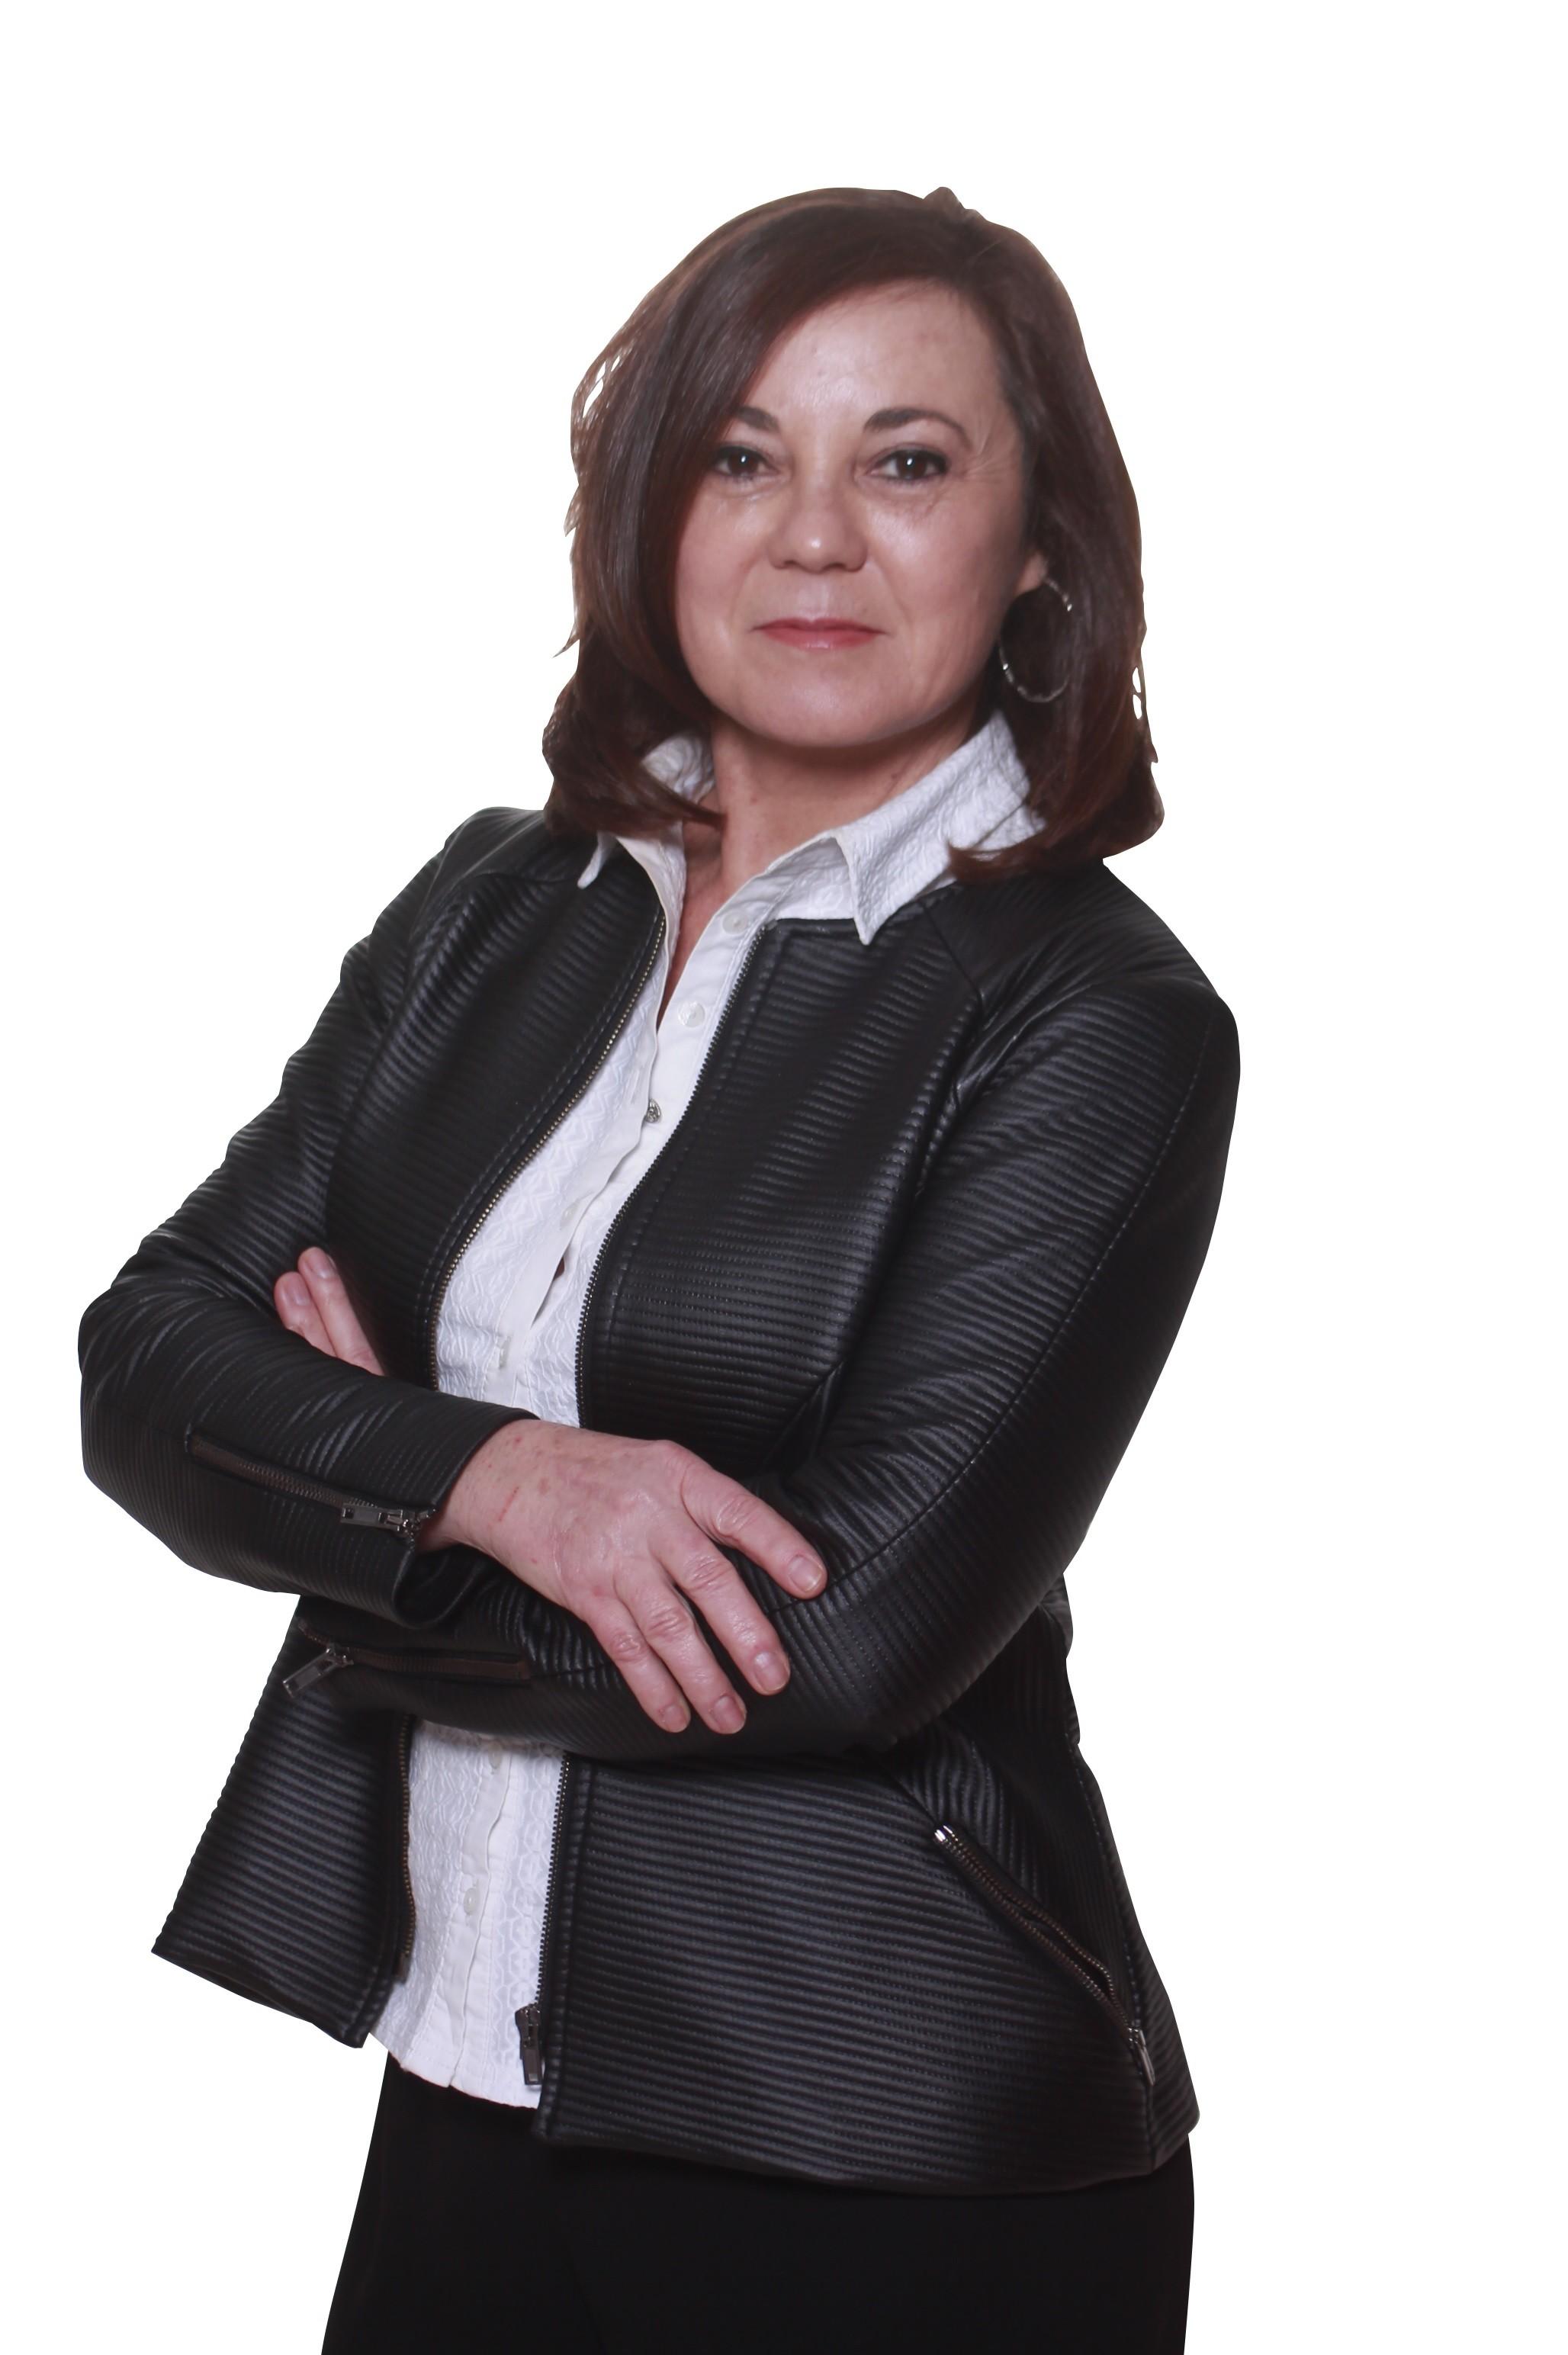 SUSANA NIETO BLAZQUEZ